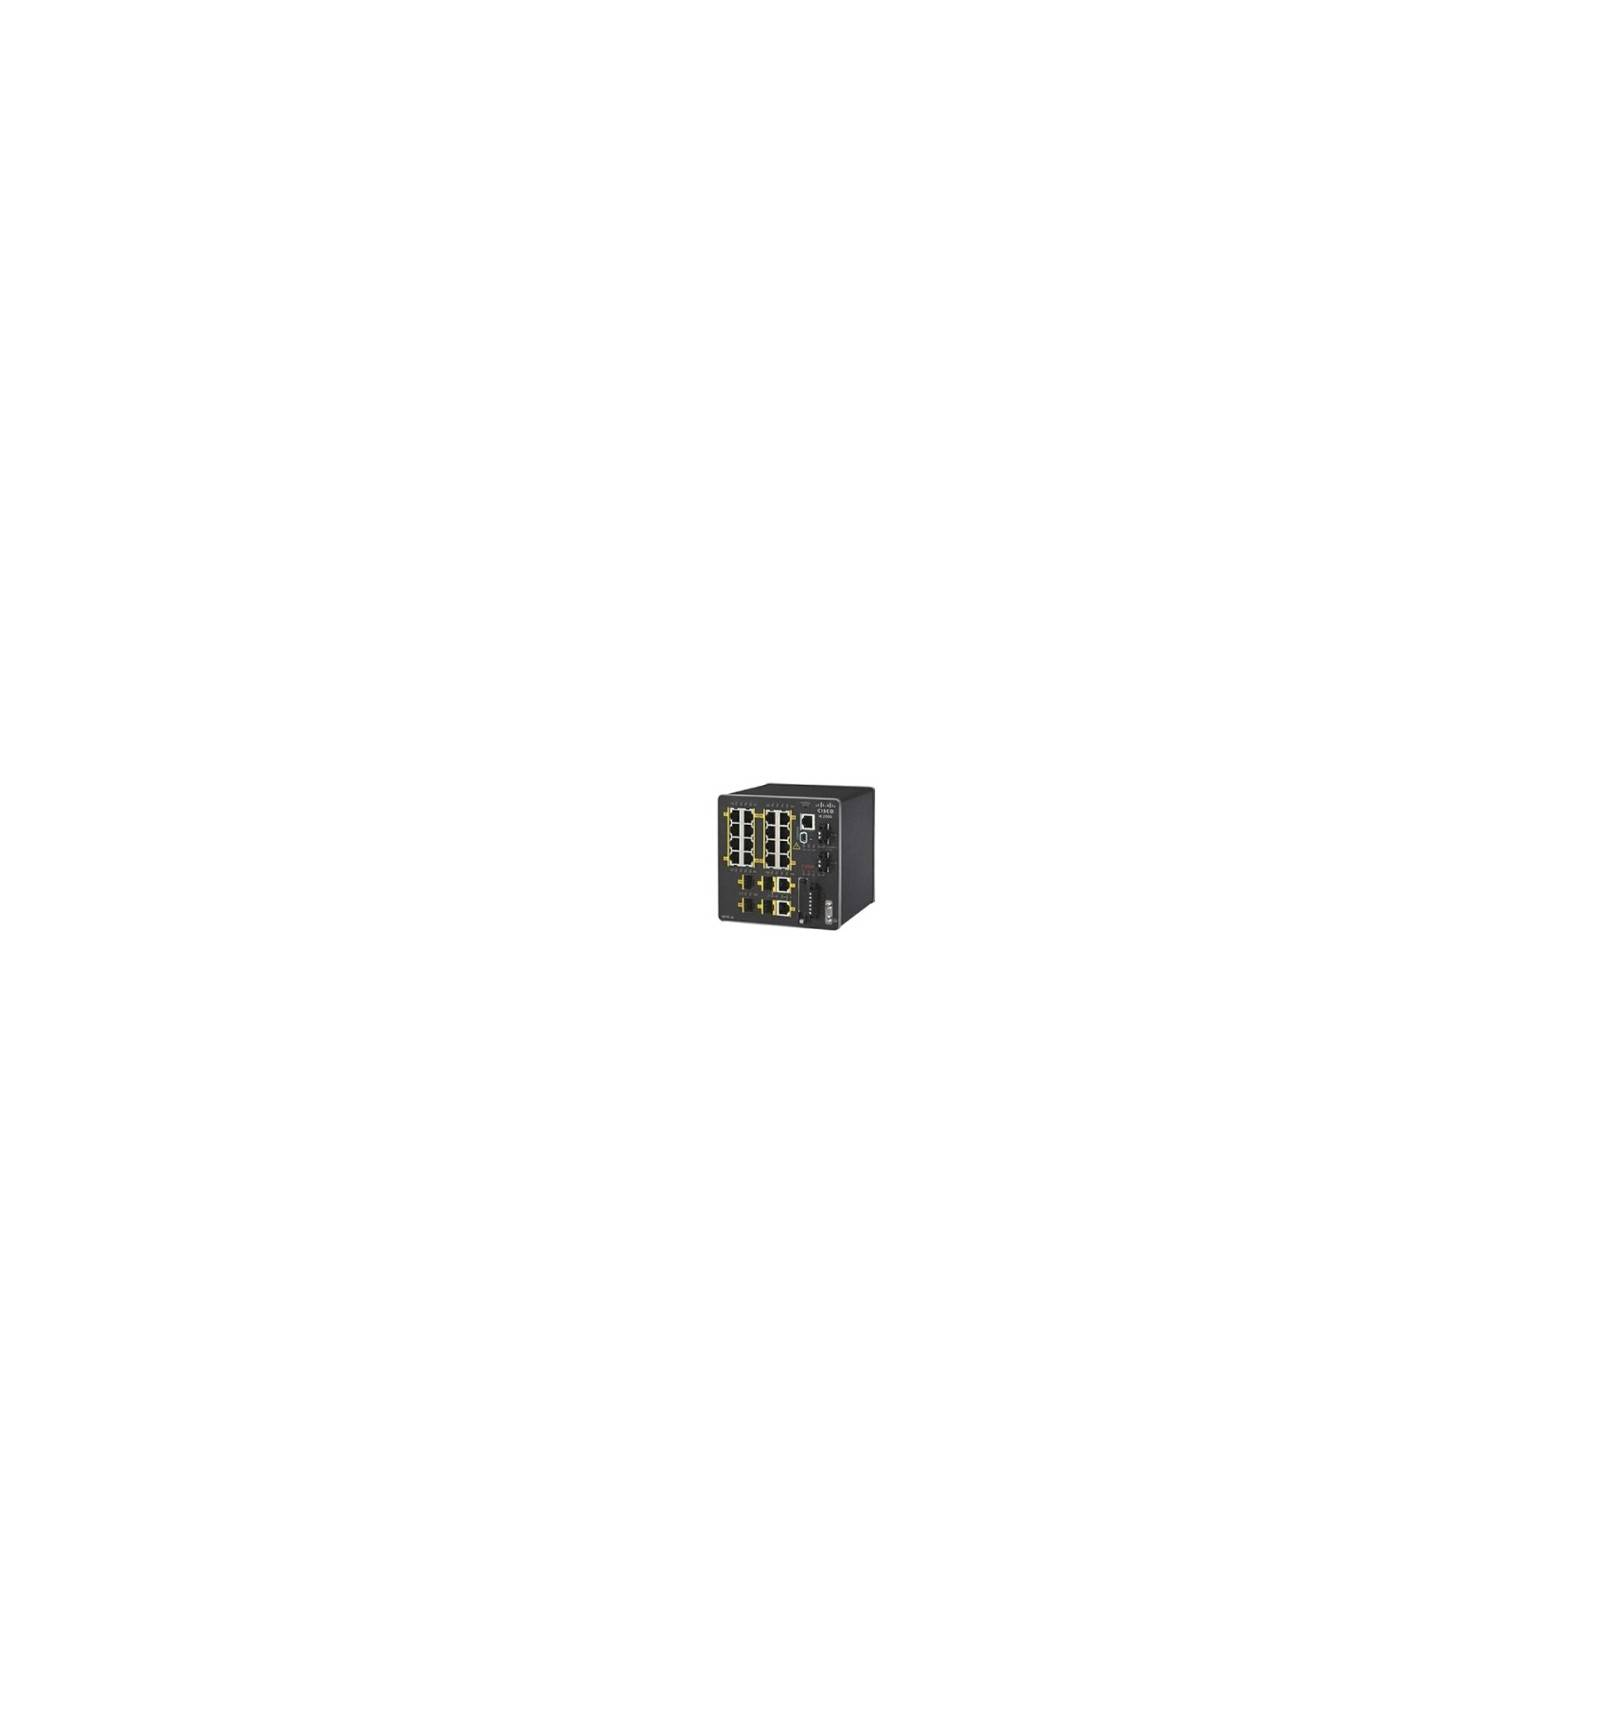 Cisco Systems IE-2000-16TC-B Managed network switch L2 Fast Ethernet (10/100) Musta verkkokytkin